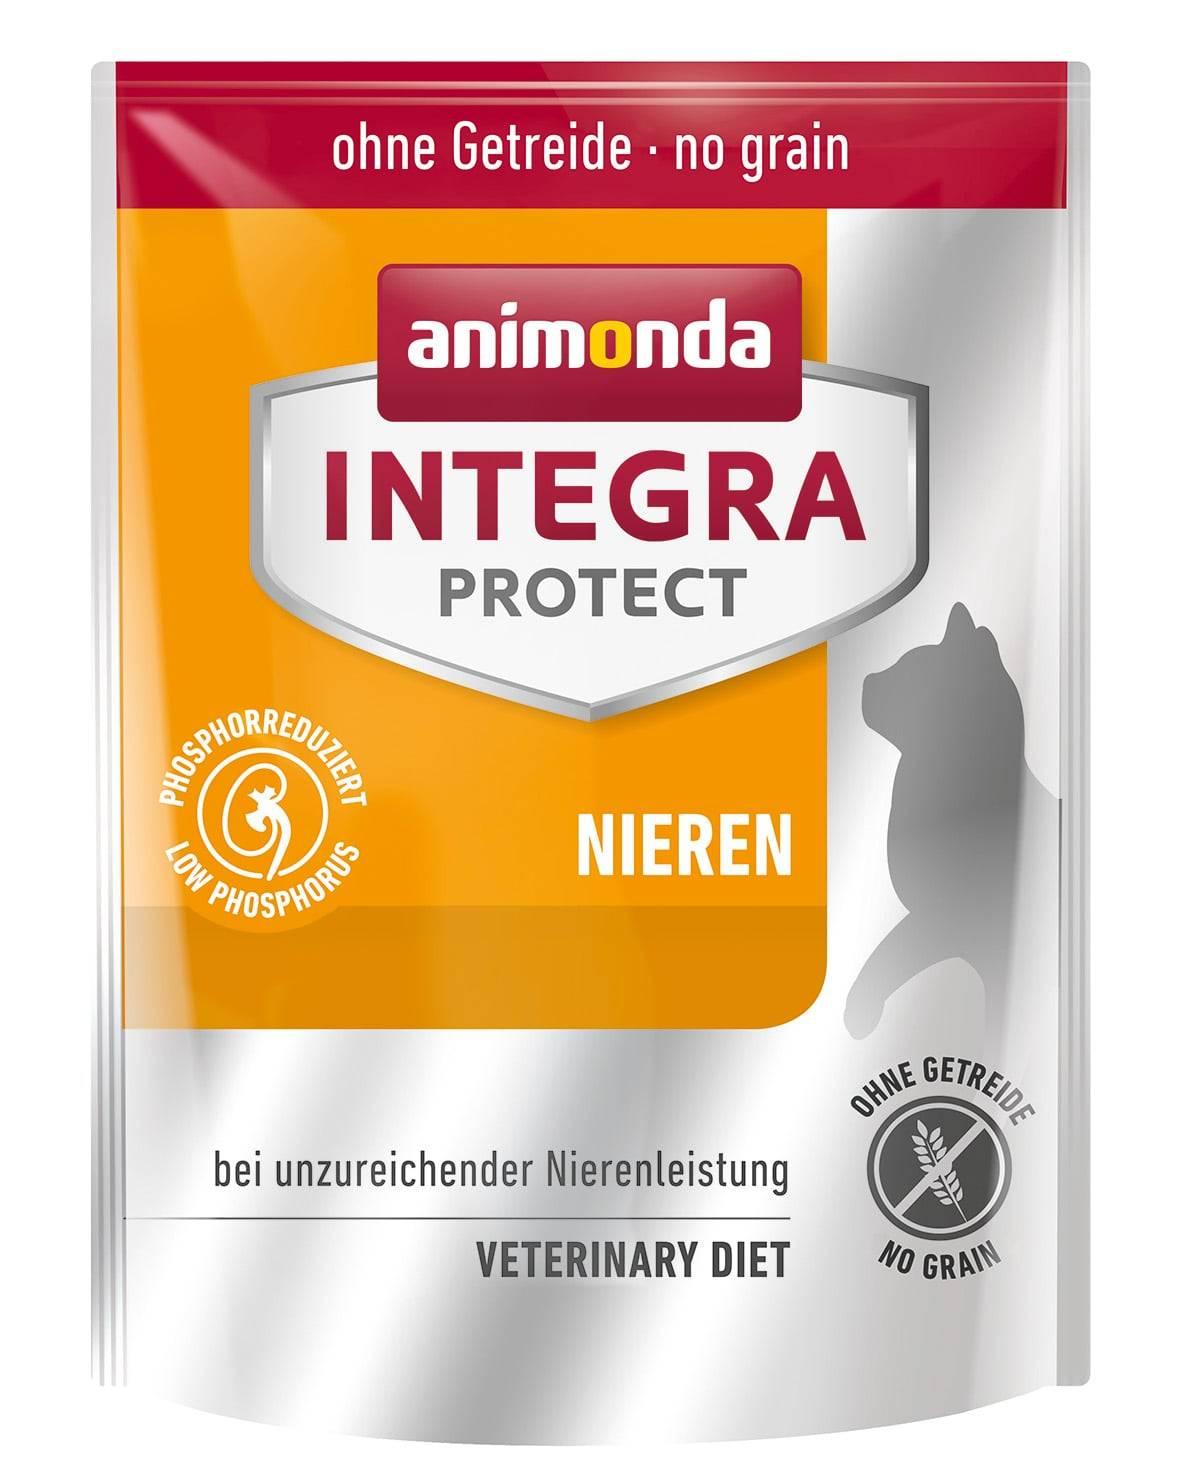 Анимонда Интегра Протект (Ренал) 1200 гр,  для взрослых кошек при ХПН(Animonda Integra Protect Cat Nieren (RENAL) петдог